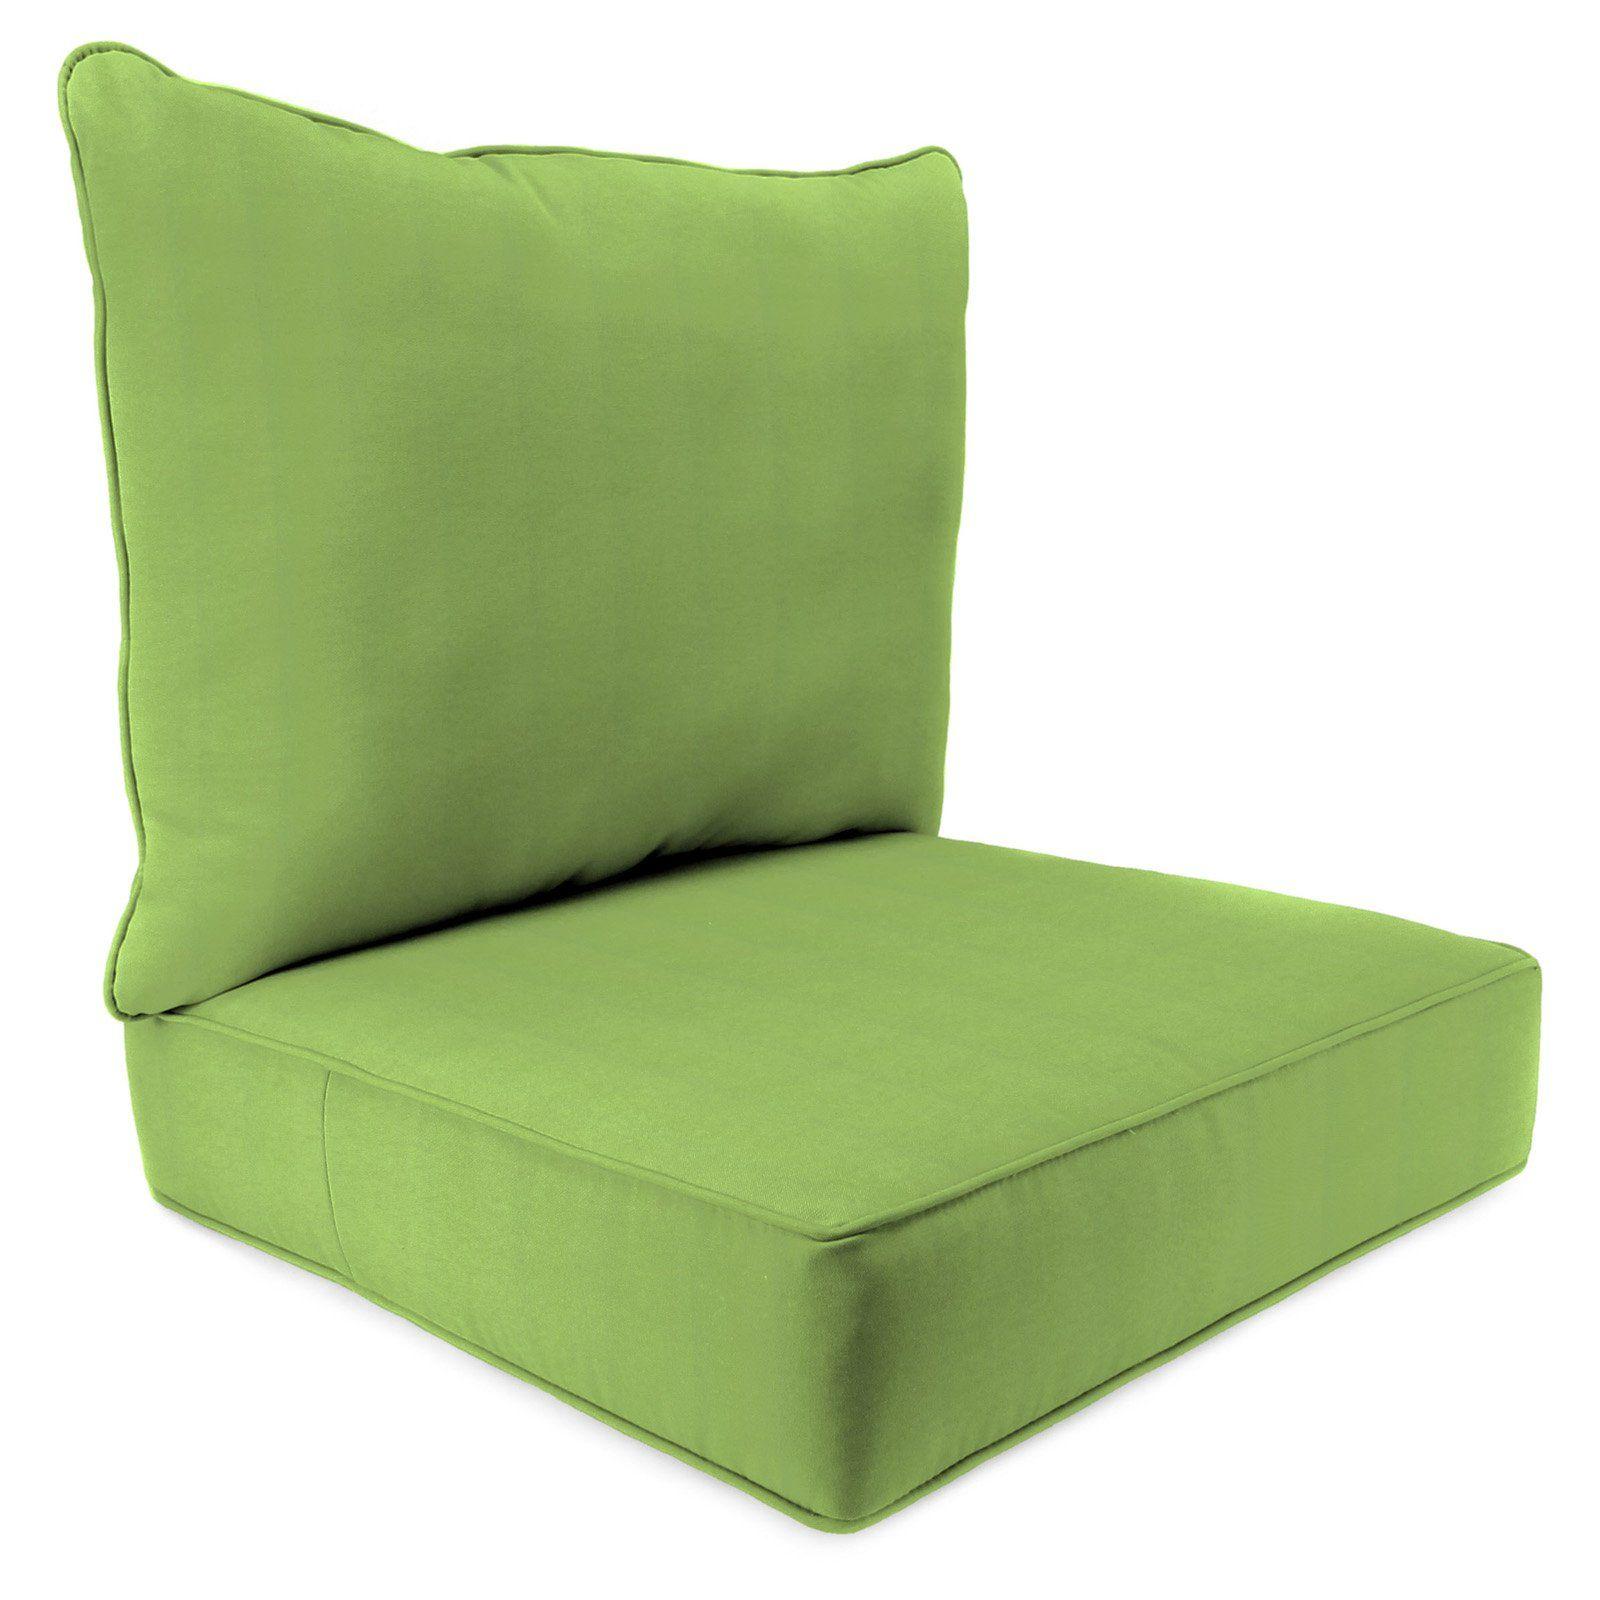 Jordan Manufacturing Sunbrella 2 Piece Outdoor Deep Seat Chair